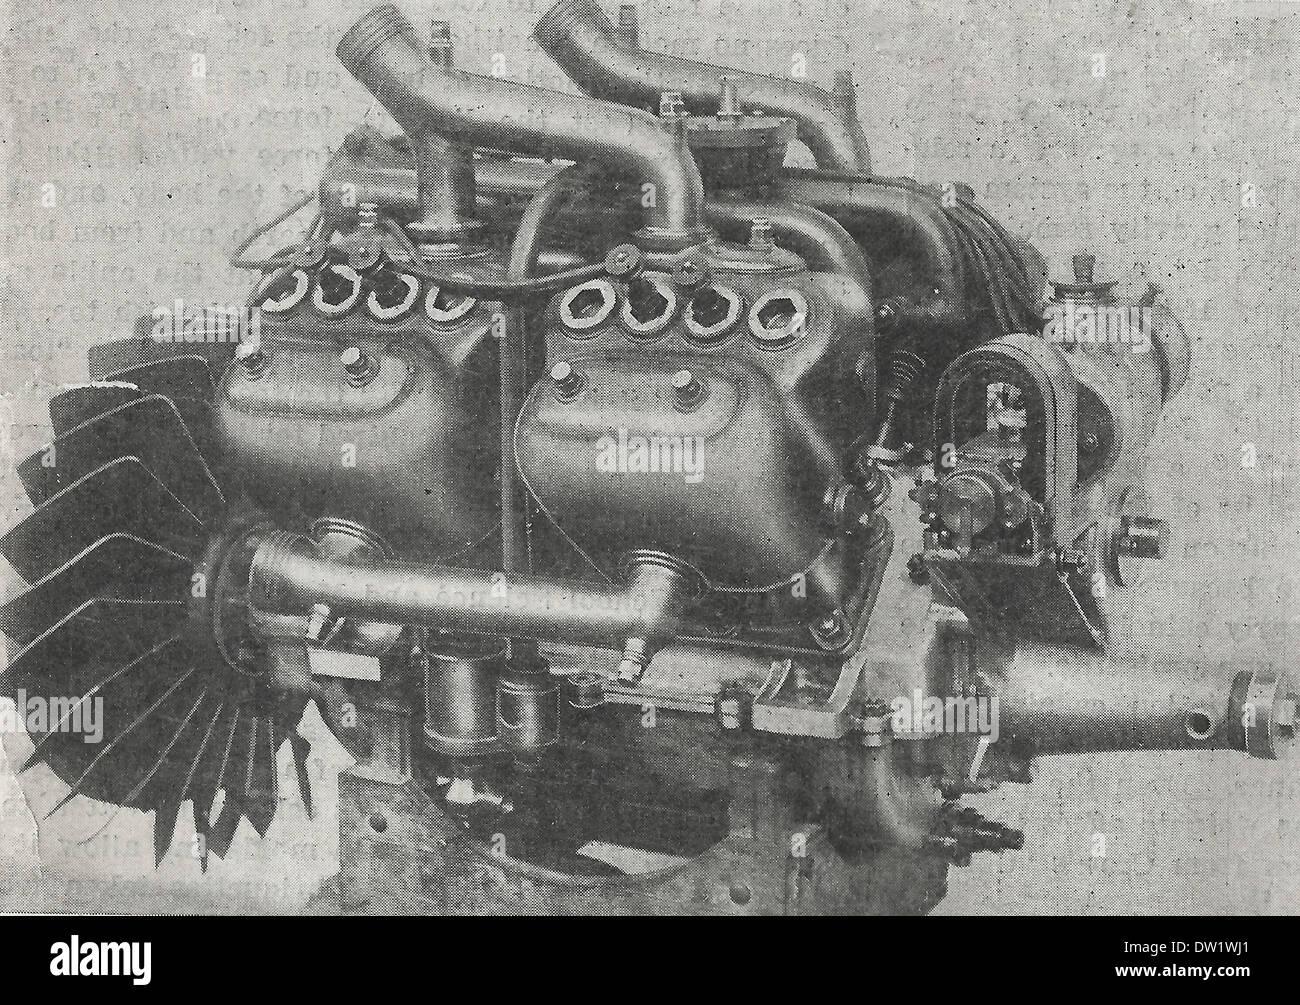 The Renault Water cooled Aeronautic motor 1909 - Stock Image